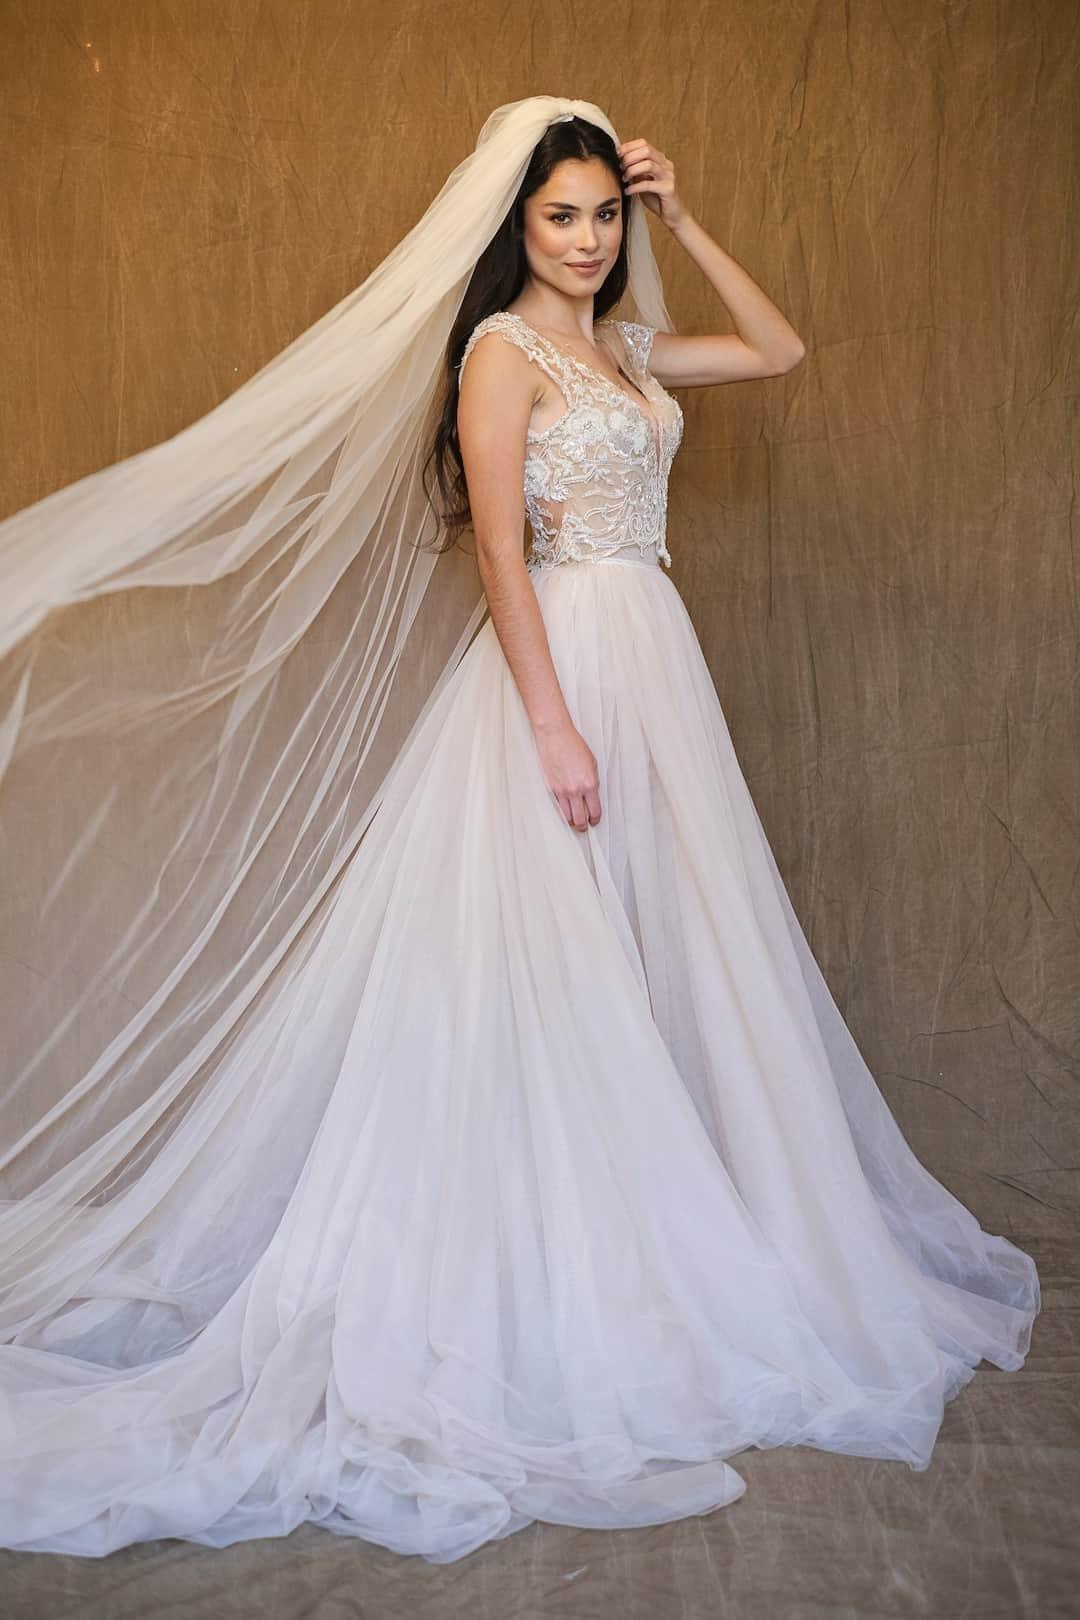 Haute Couture Eskuvoi Ruhak - Galia Lahav - Gala 607 - front